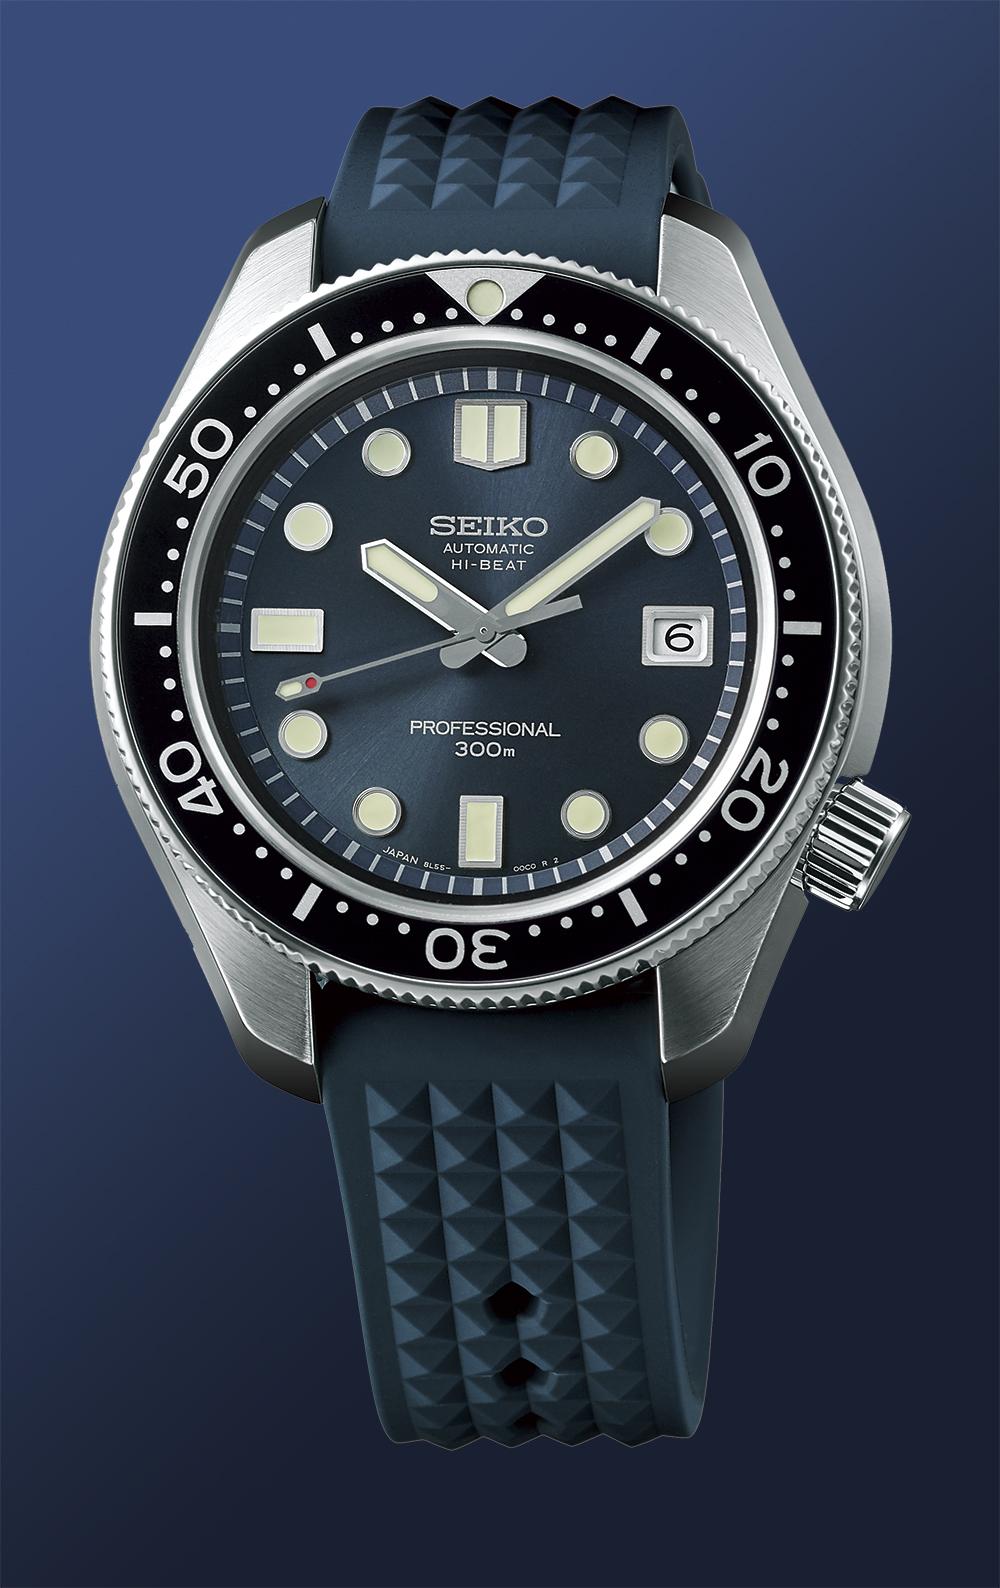 Seiko Diver's 55th Anniversary Trilogy Recreación del Professional Diver's de 1968